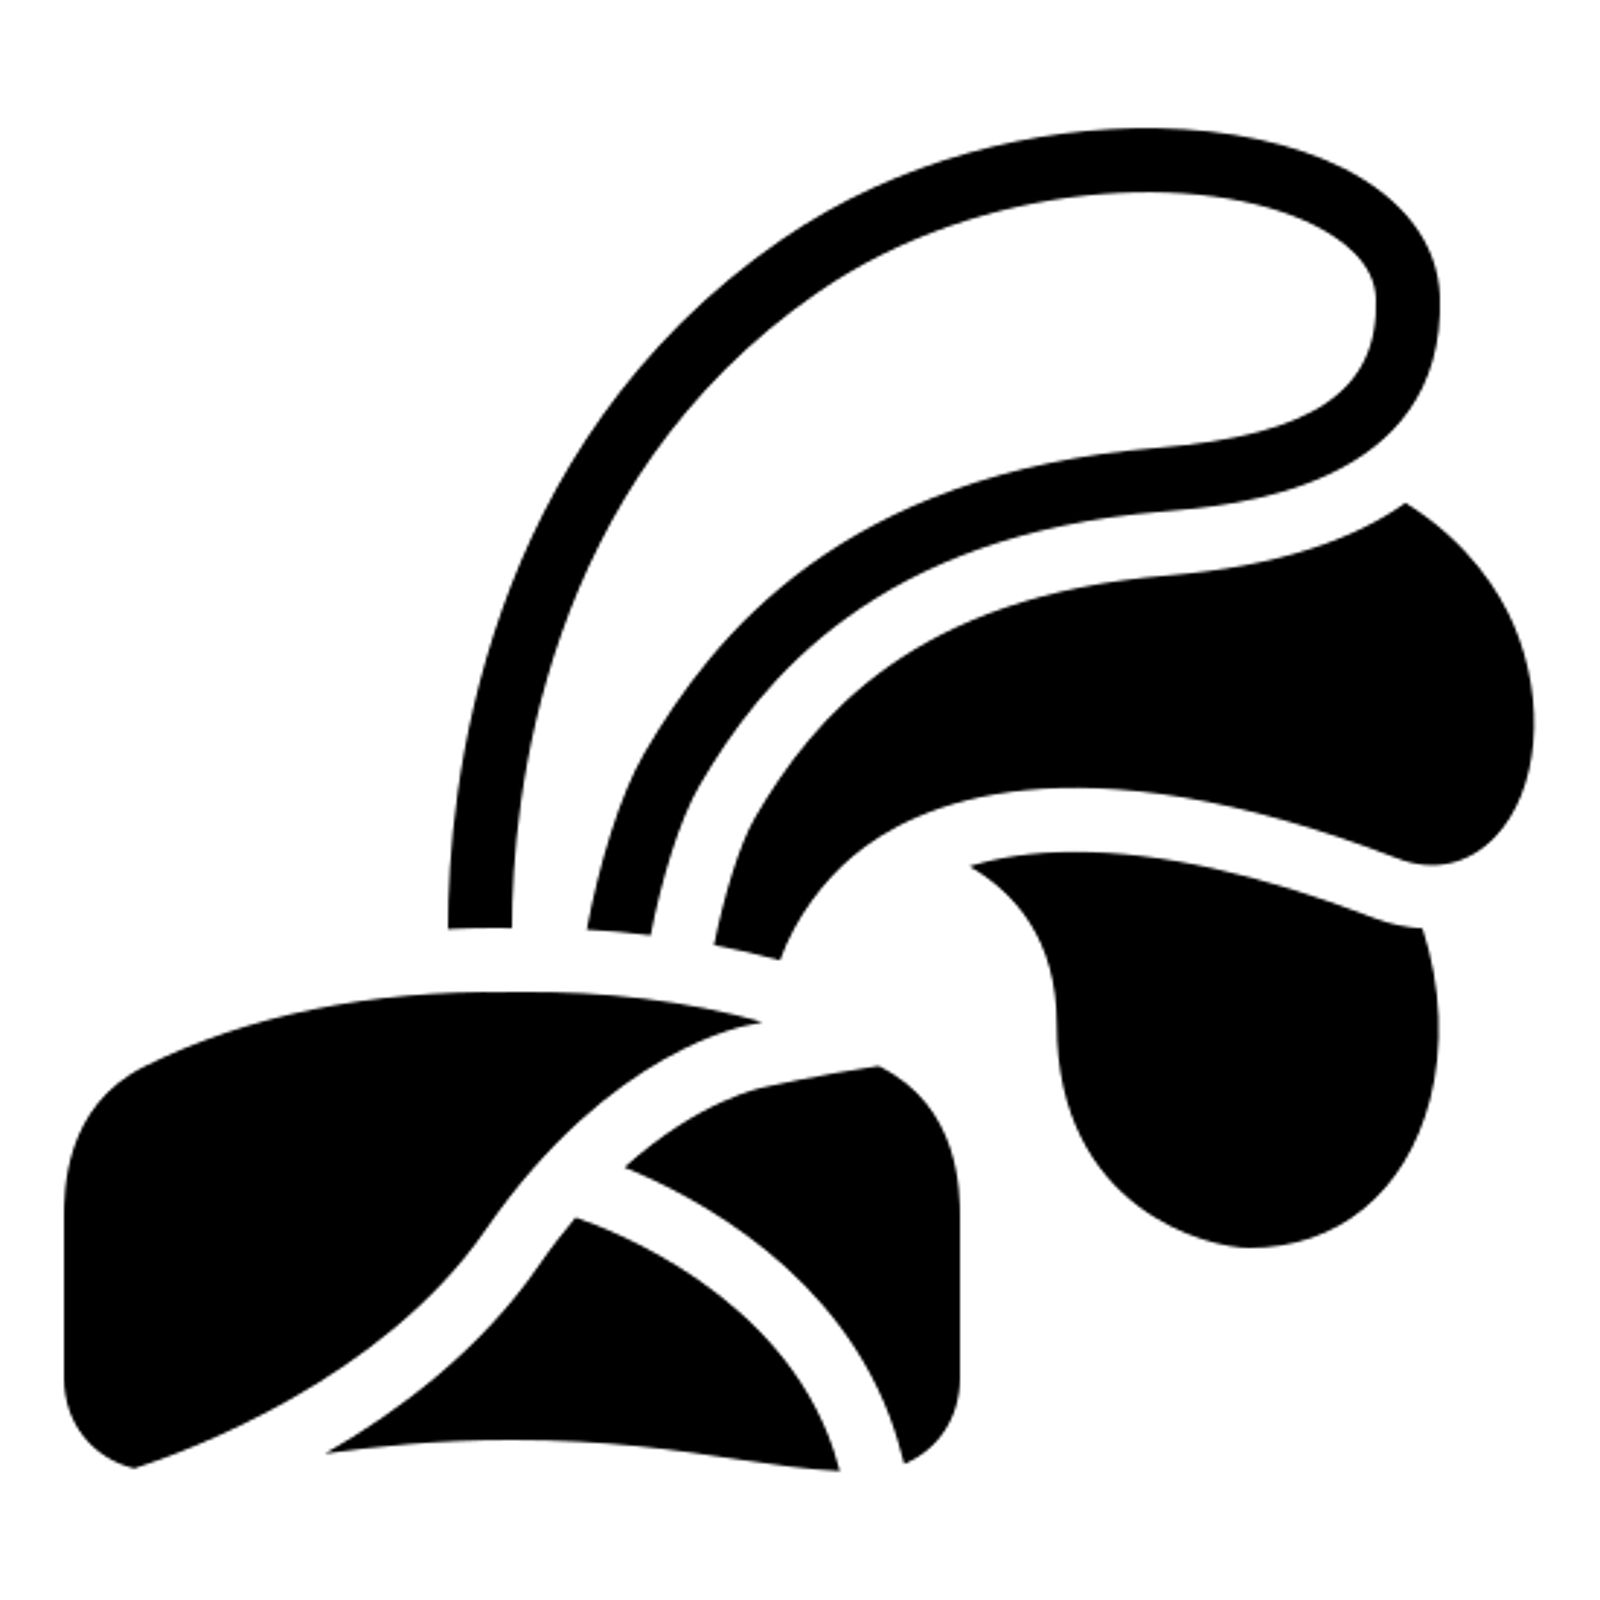 Seminole Headdress Filled icon